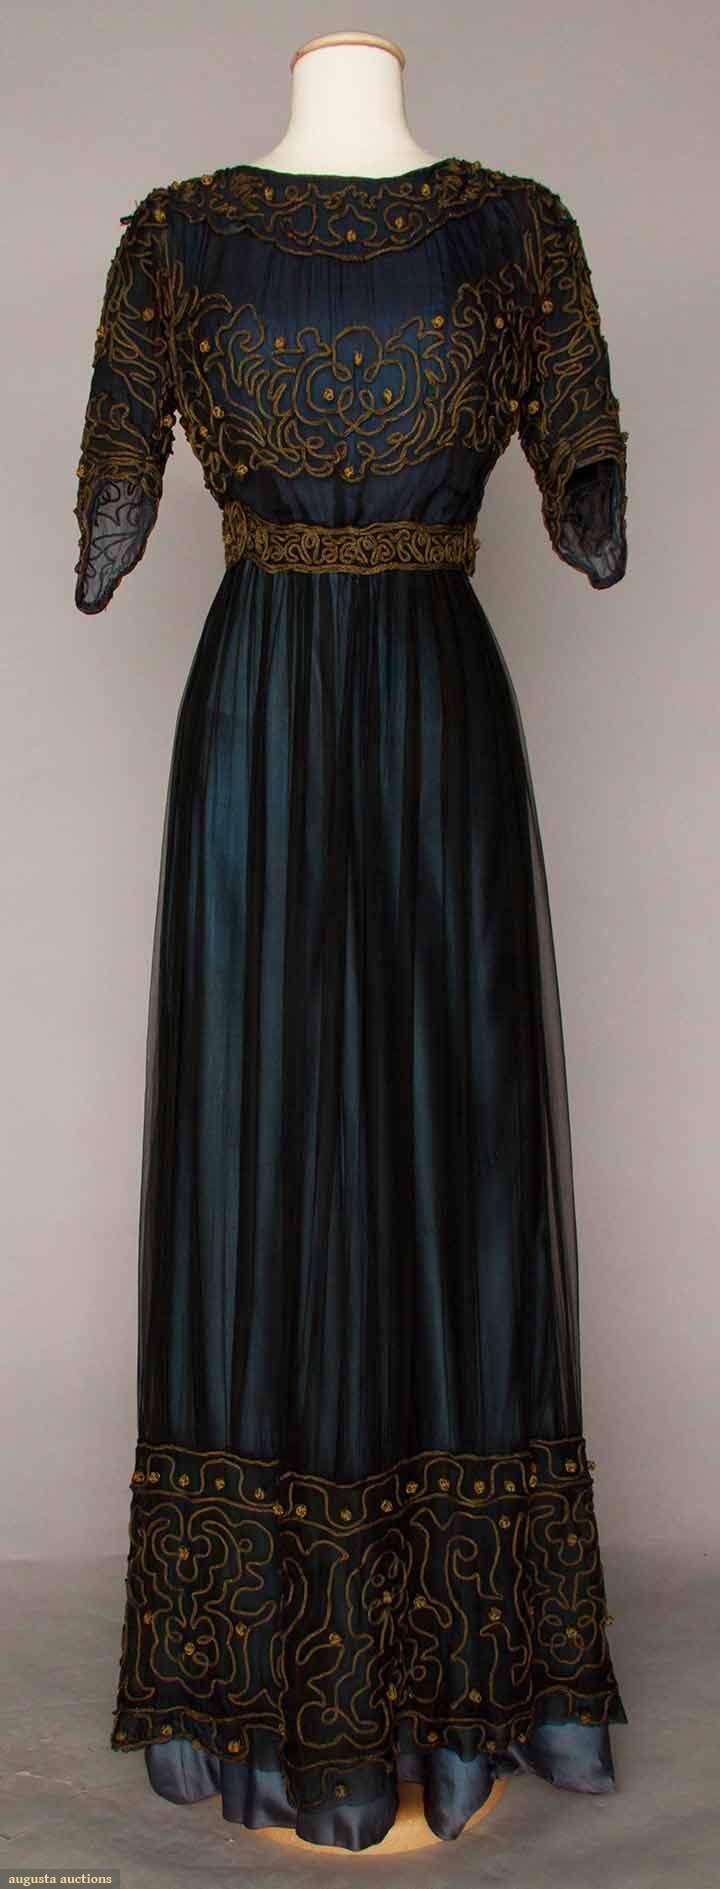 Augusta Auctions BLUE AFTERNOON DRESS, c. 1910 Go Back Lot: 1008 May 10, 2016 - Sturbridge, MA Sturbridge, Massachusetts Marine blue silk & chiffon dress w/ gold soutache, some holes, fair